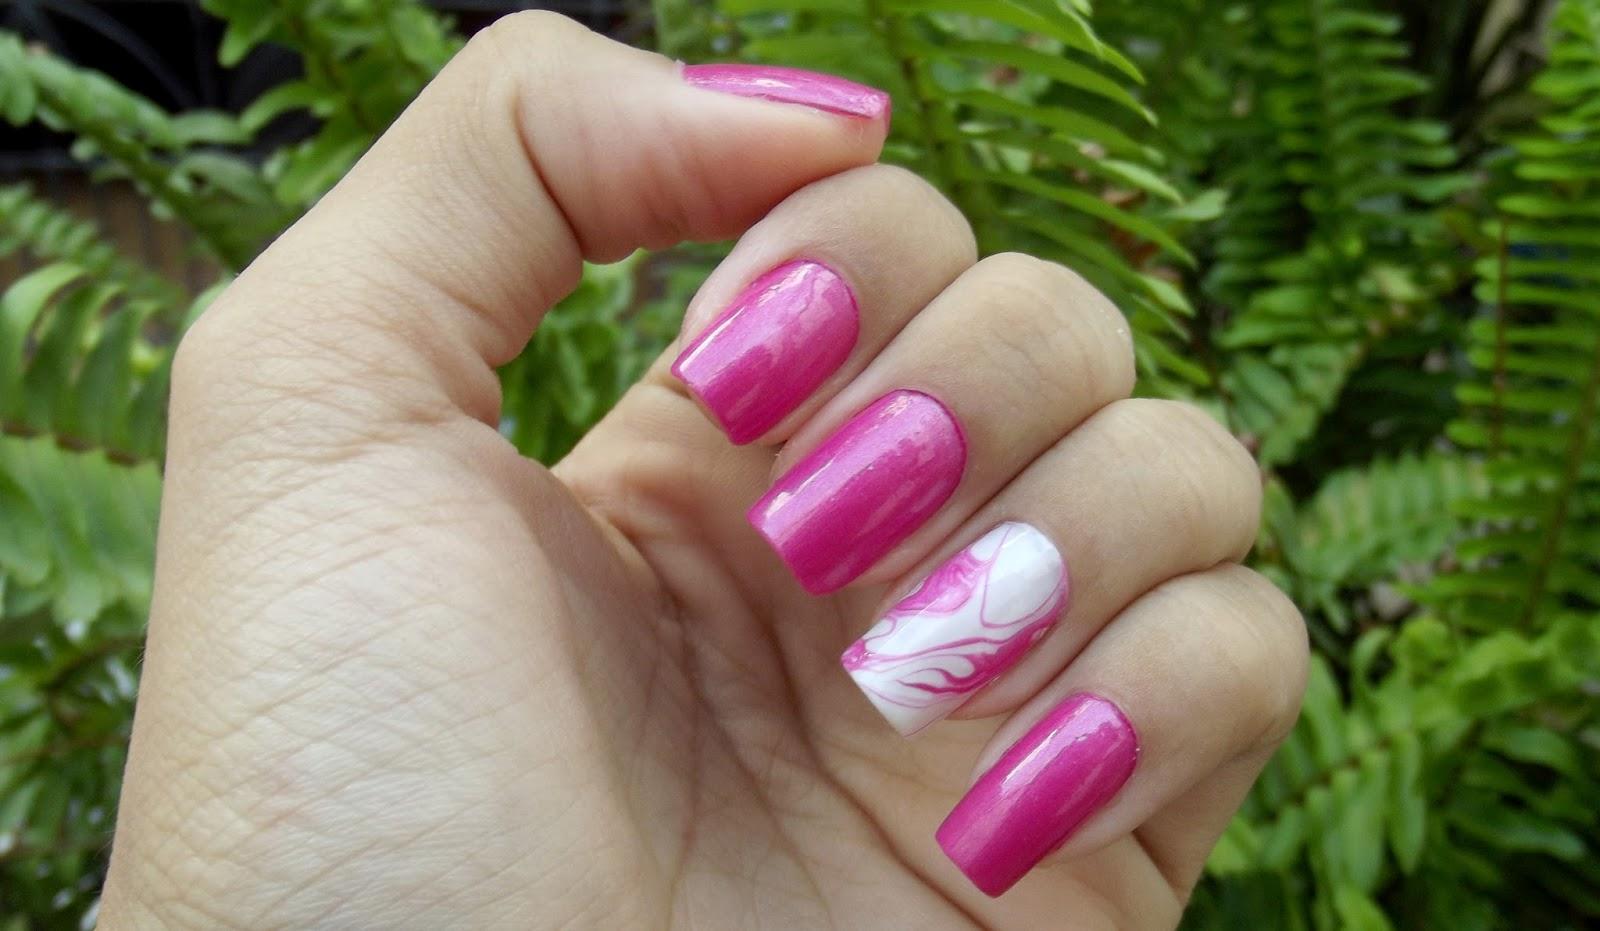 outubro rosa, #OutubroRosa, esmalte rosa, esmalte musa avon, esmalte musa, esmalte rosa avon, esmalte avon, esmaltes avon, esmalte outubro rosa, filha unica, filha única, unhas marmorizadas rosa, unhas rosa,